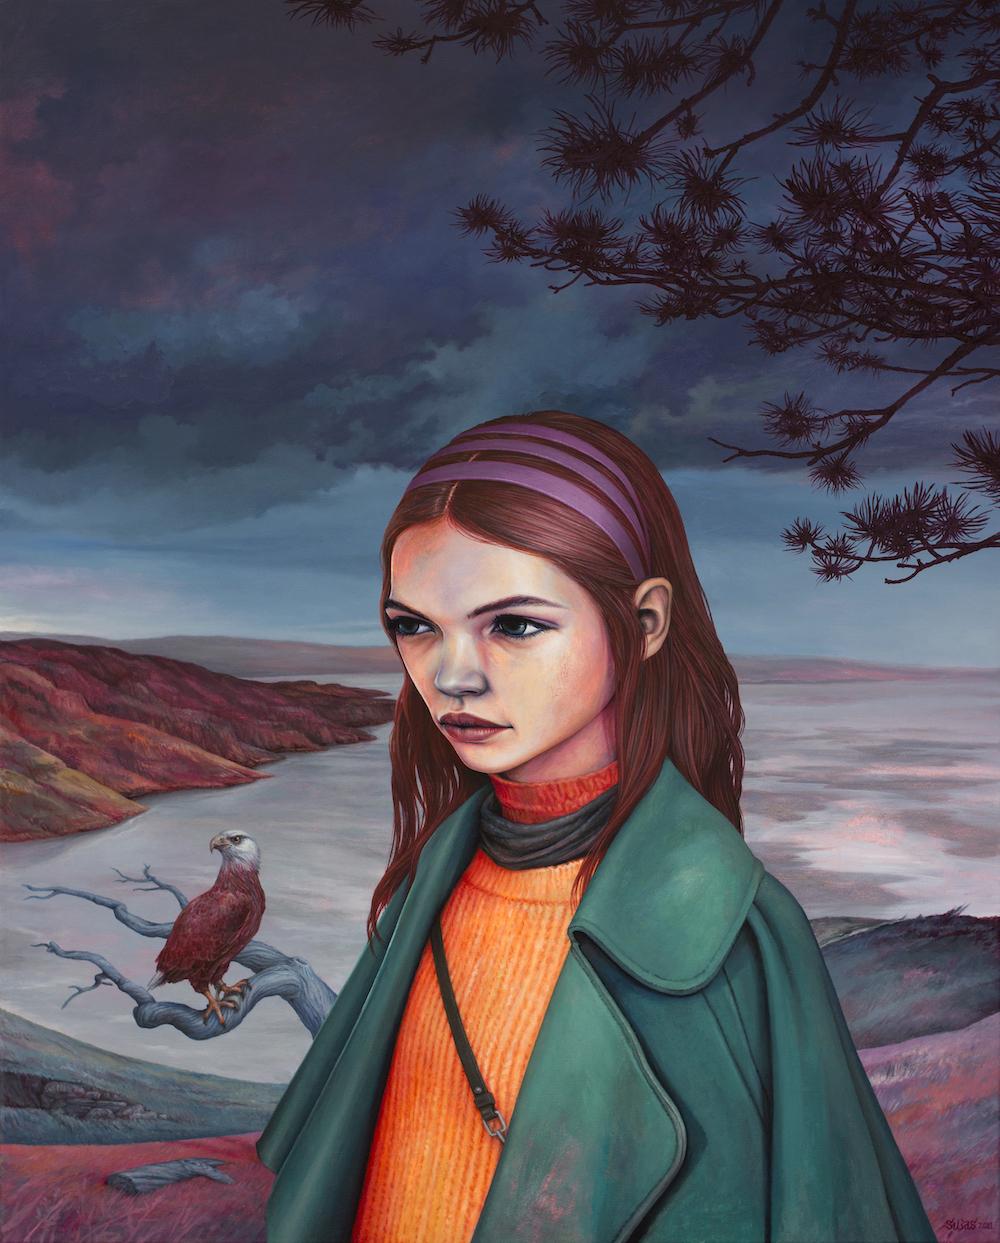 Silas - Farane Faro - oil on canvas - 100 x 80 cm - 2021s